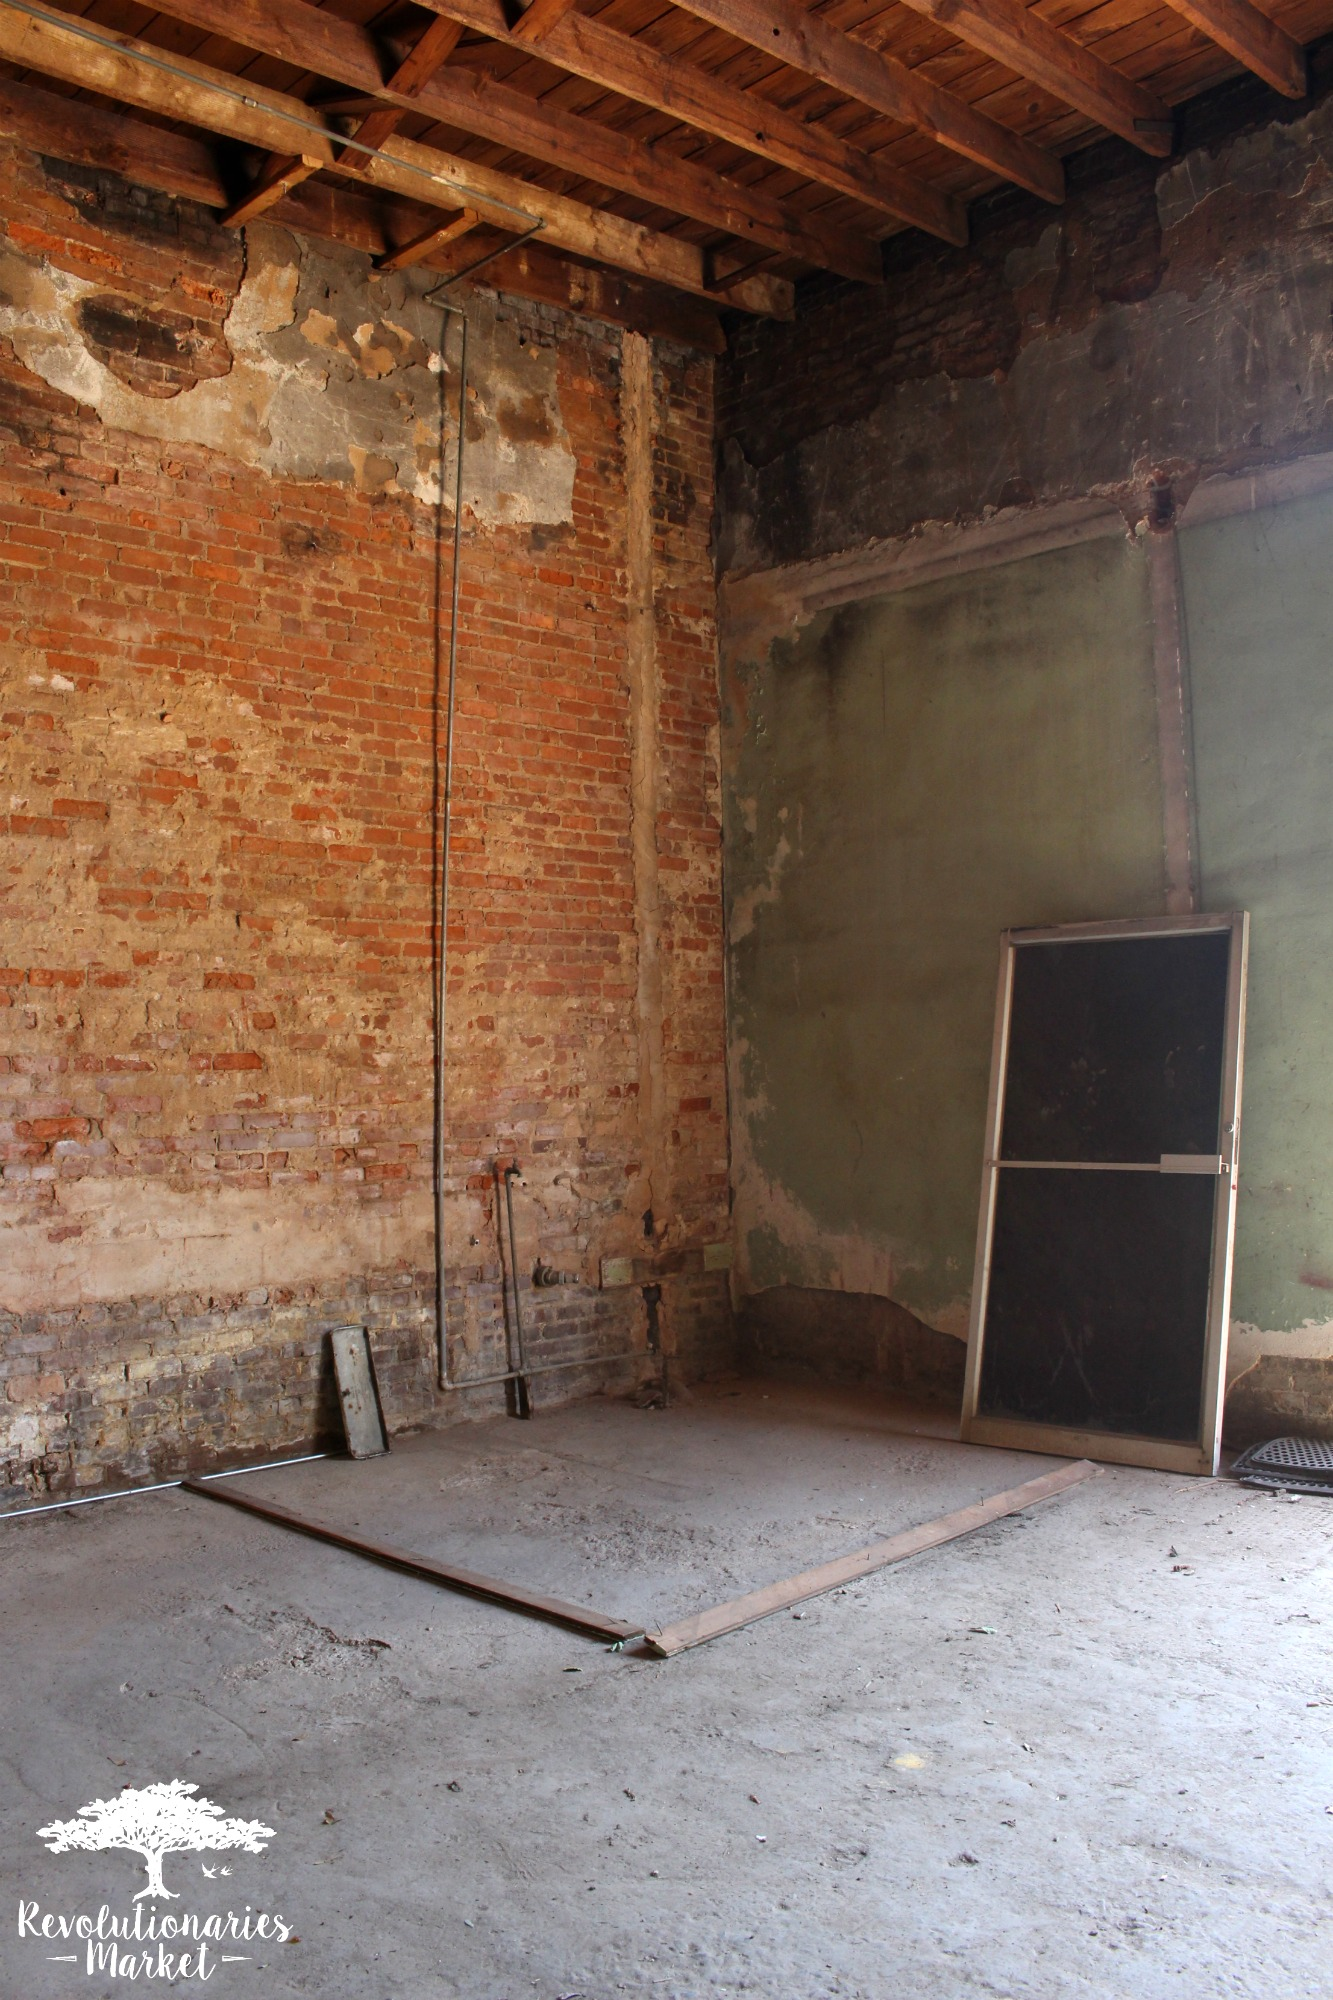 Revolutionaries Market Renovation: Update #1